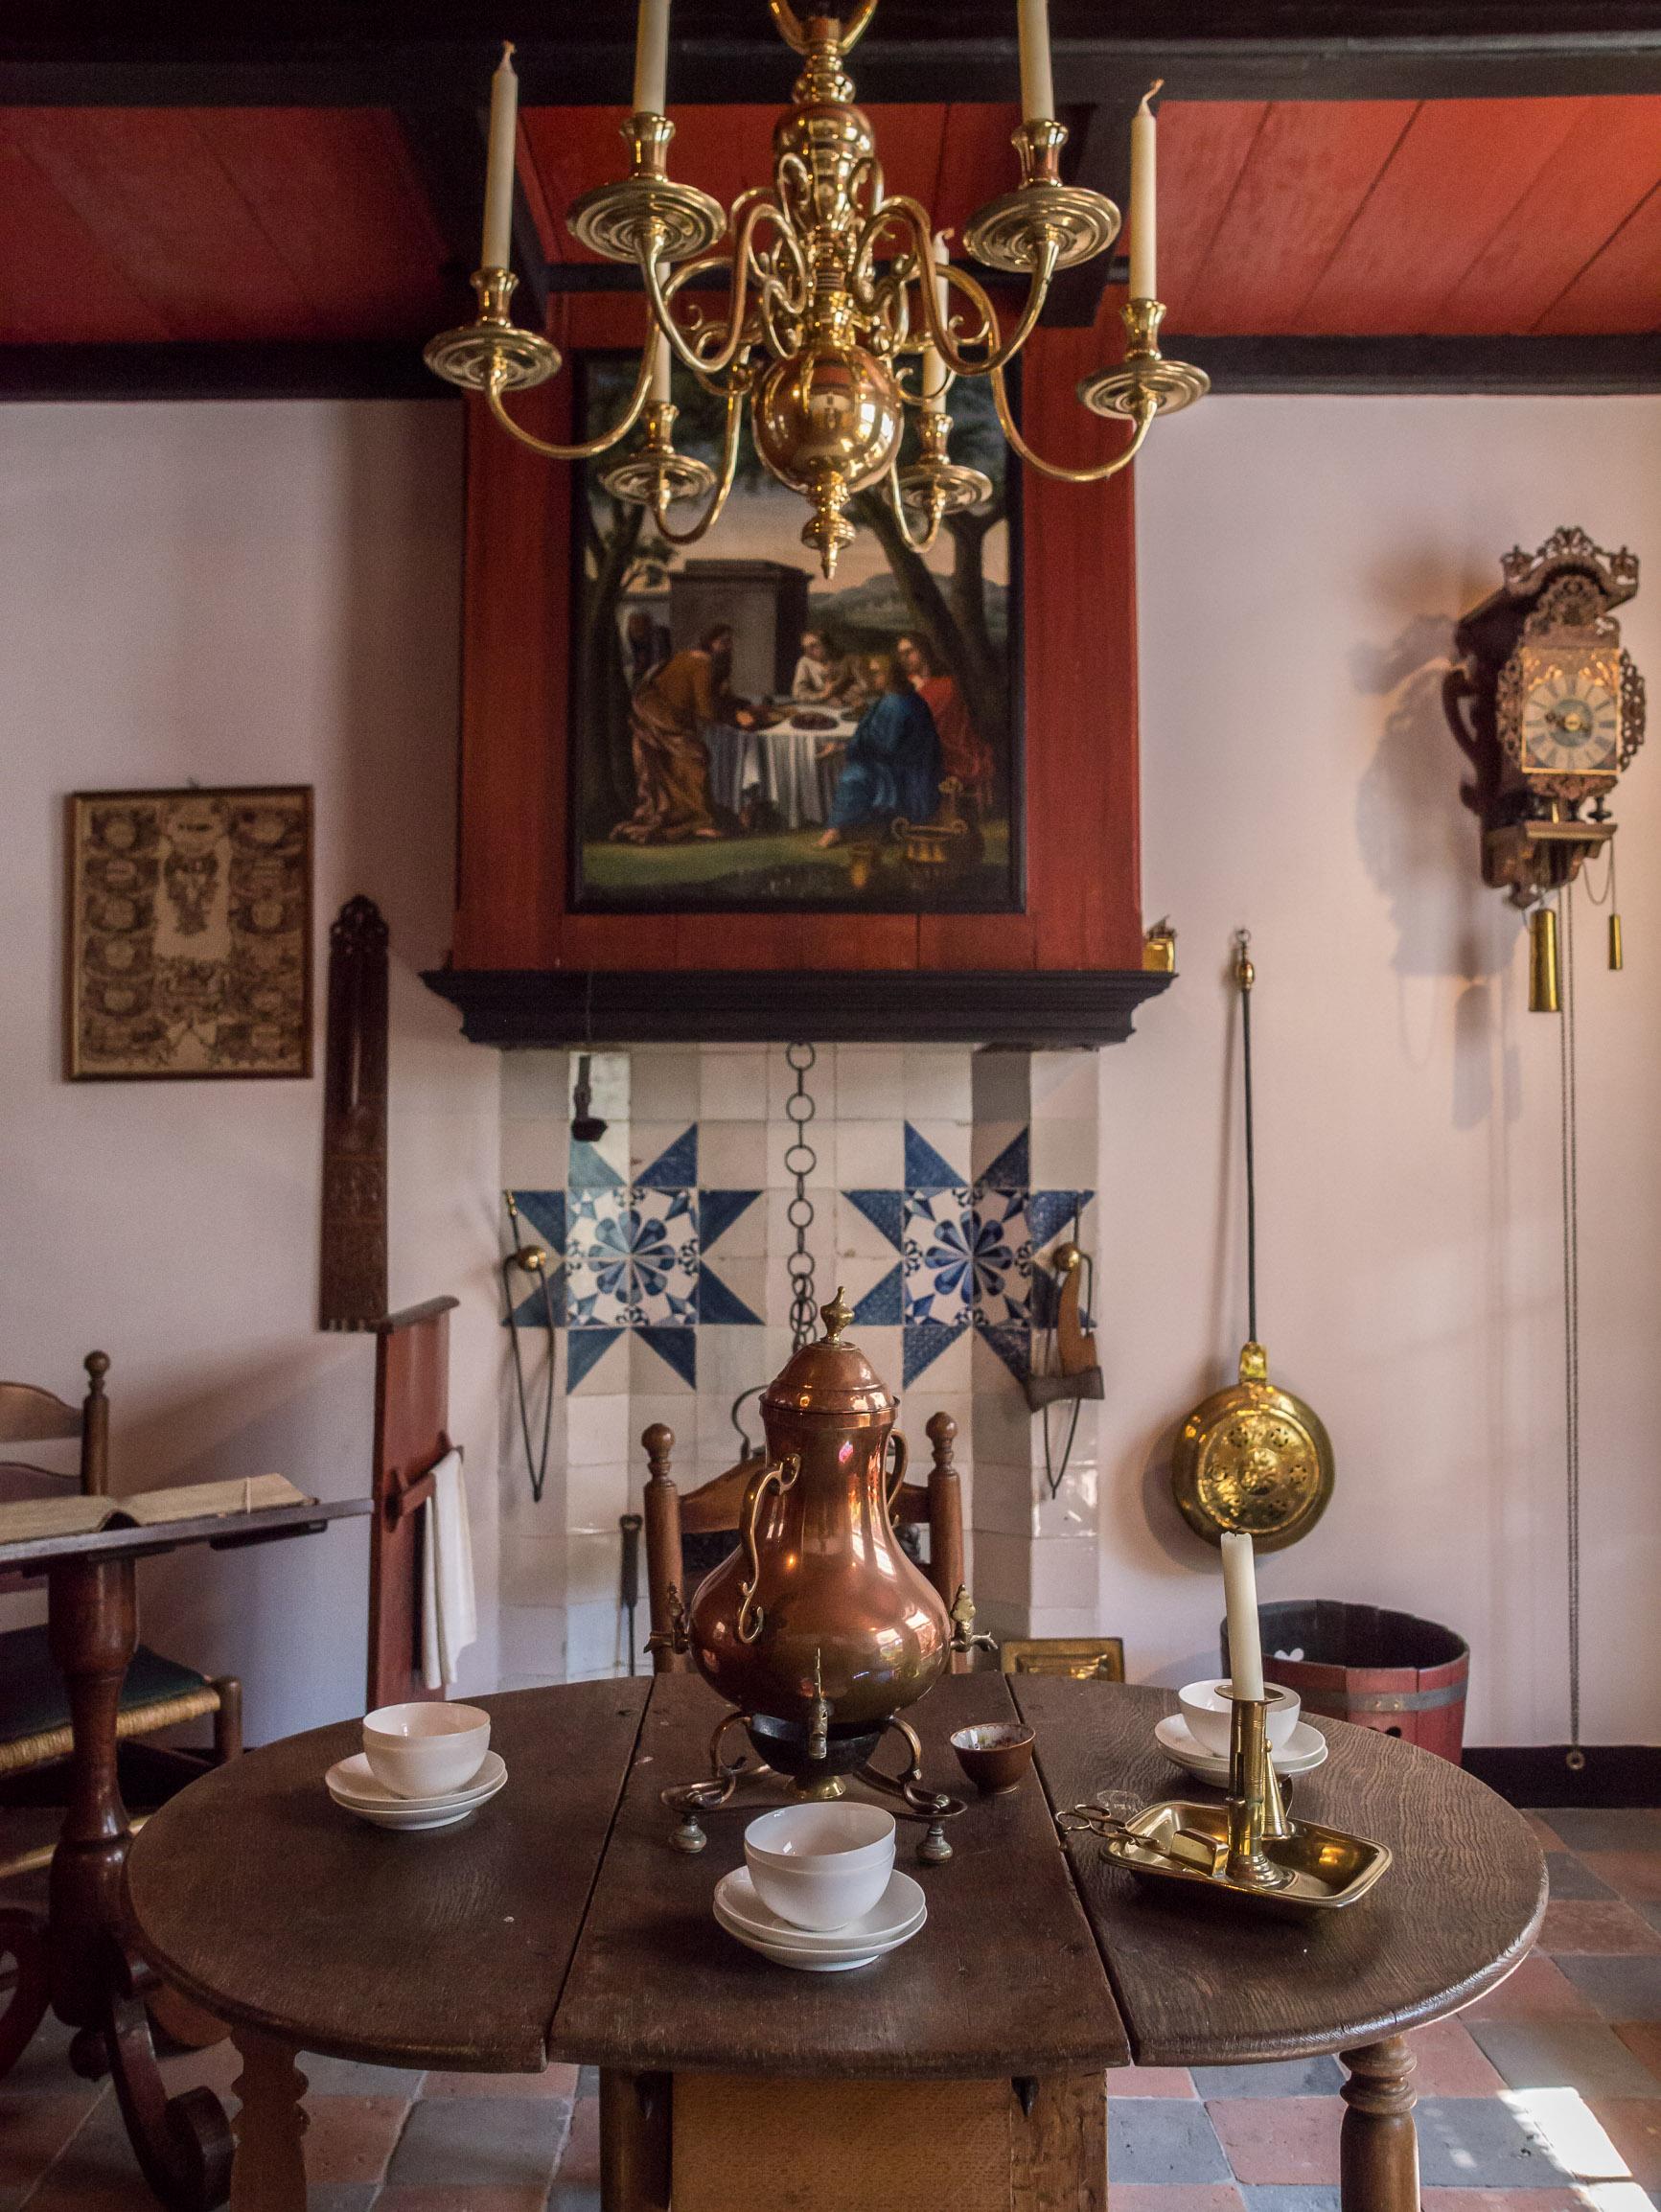 File:Het Hoogeland openluchtmuseum in Warffum, Oude woonkamer.jpg ...